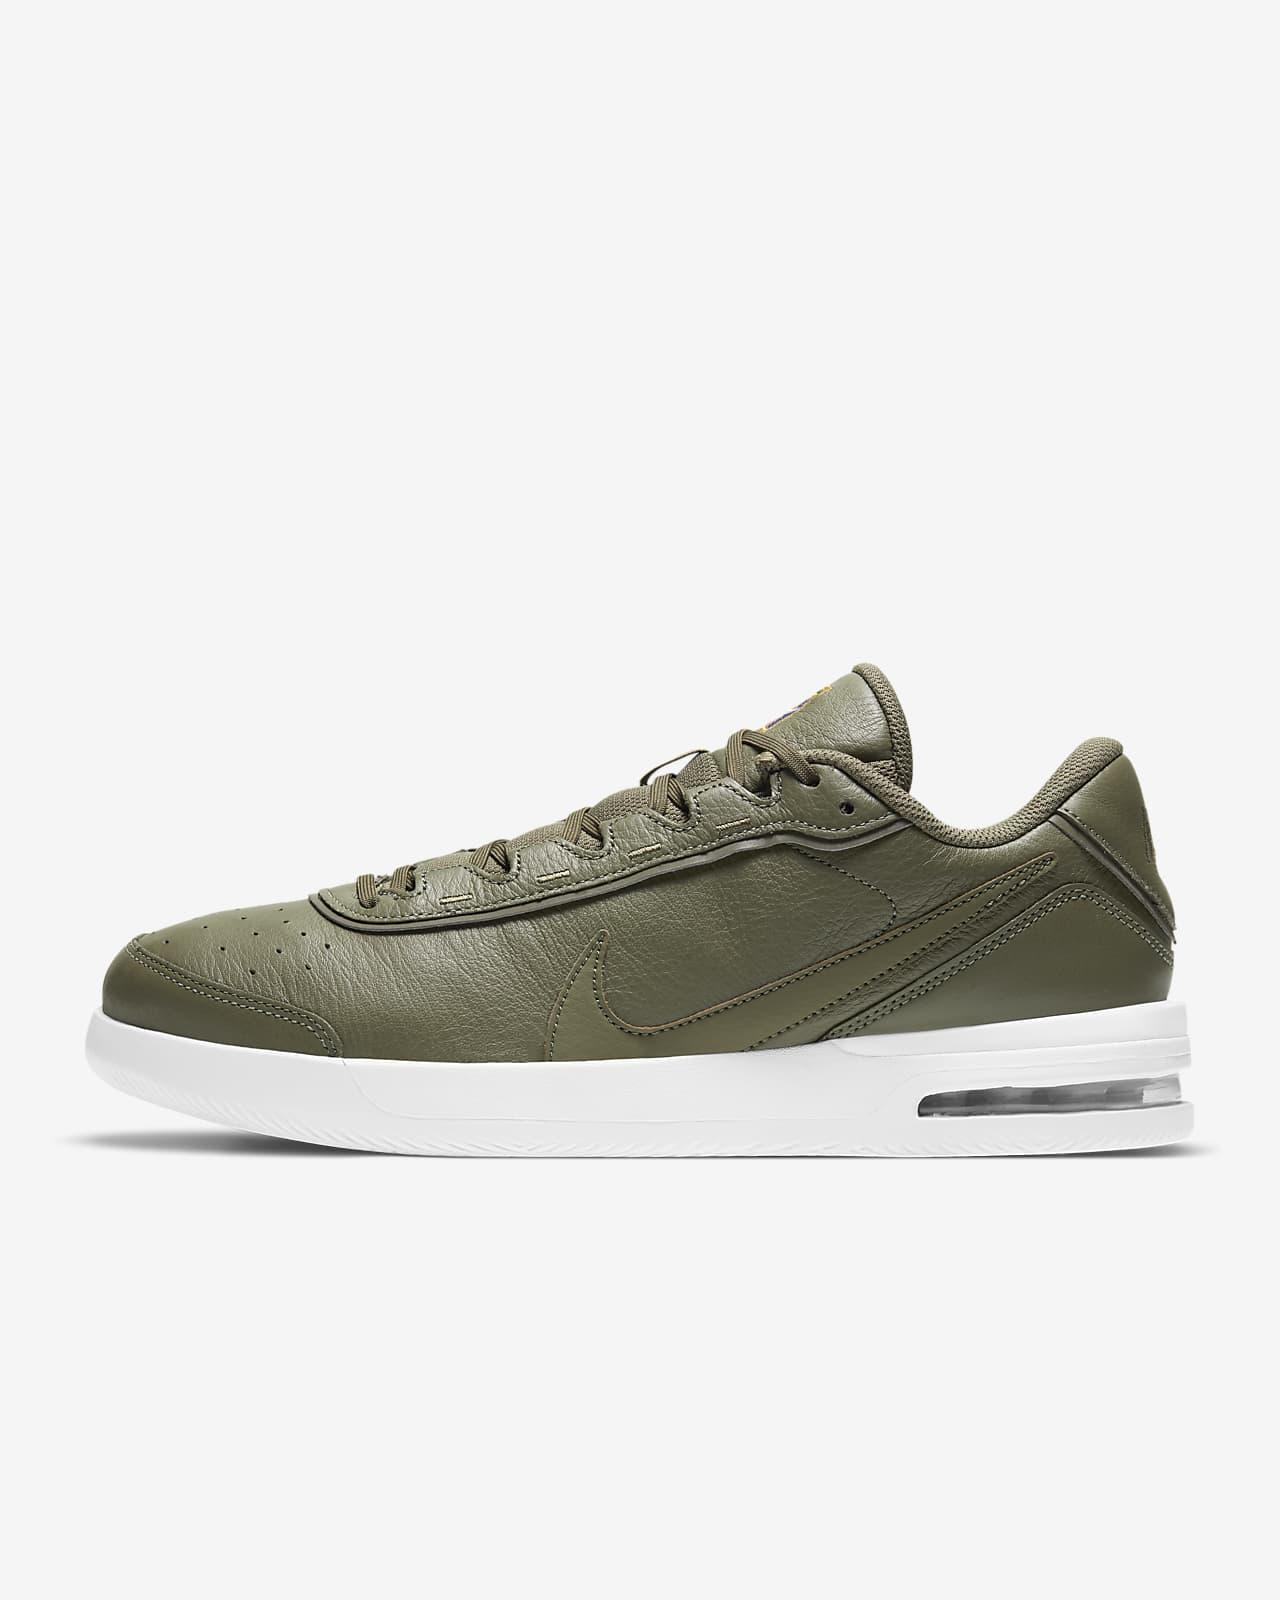 NikeCourt Air Max Vapor Wing Premium Men's Tennis Shoe